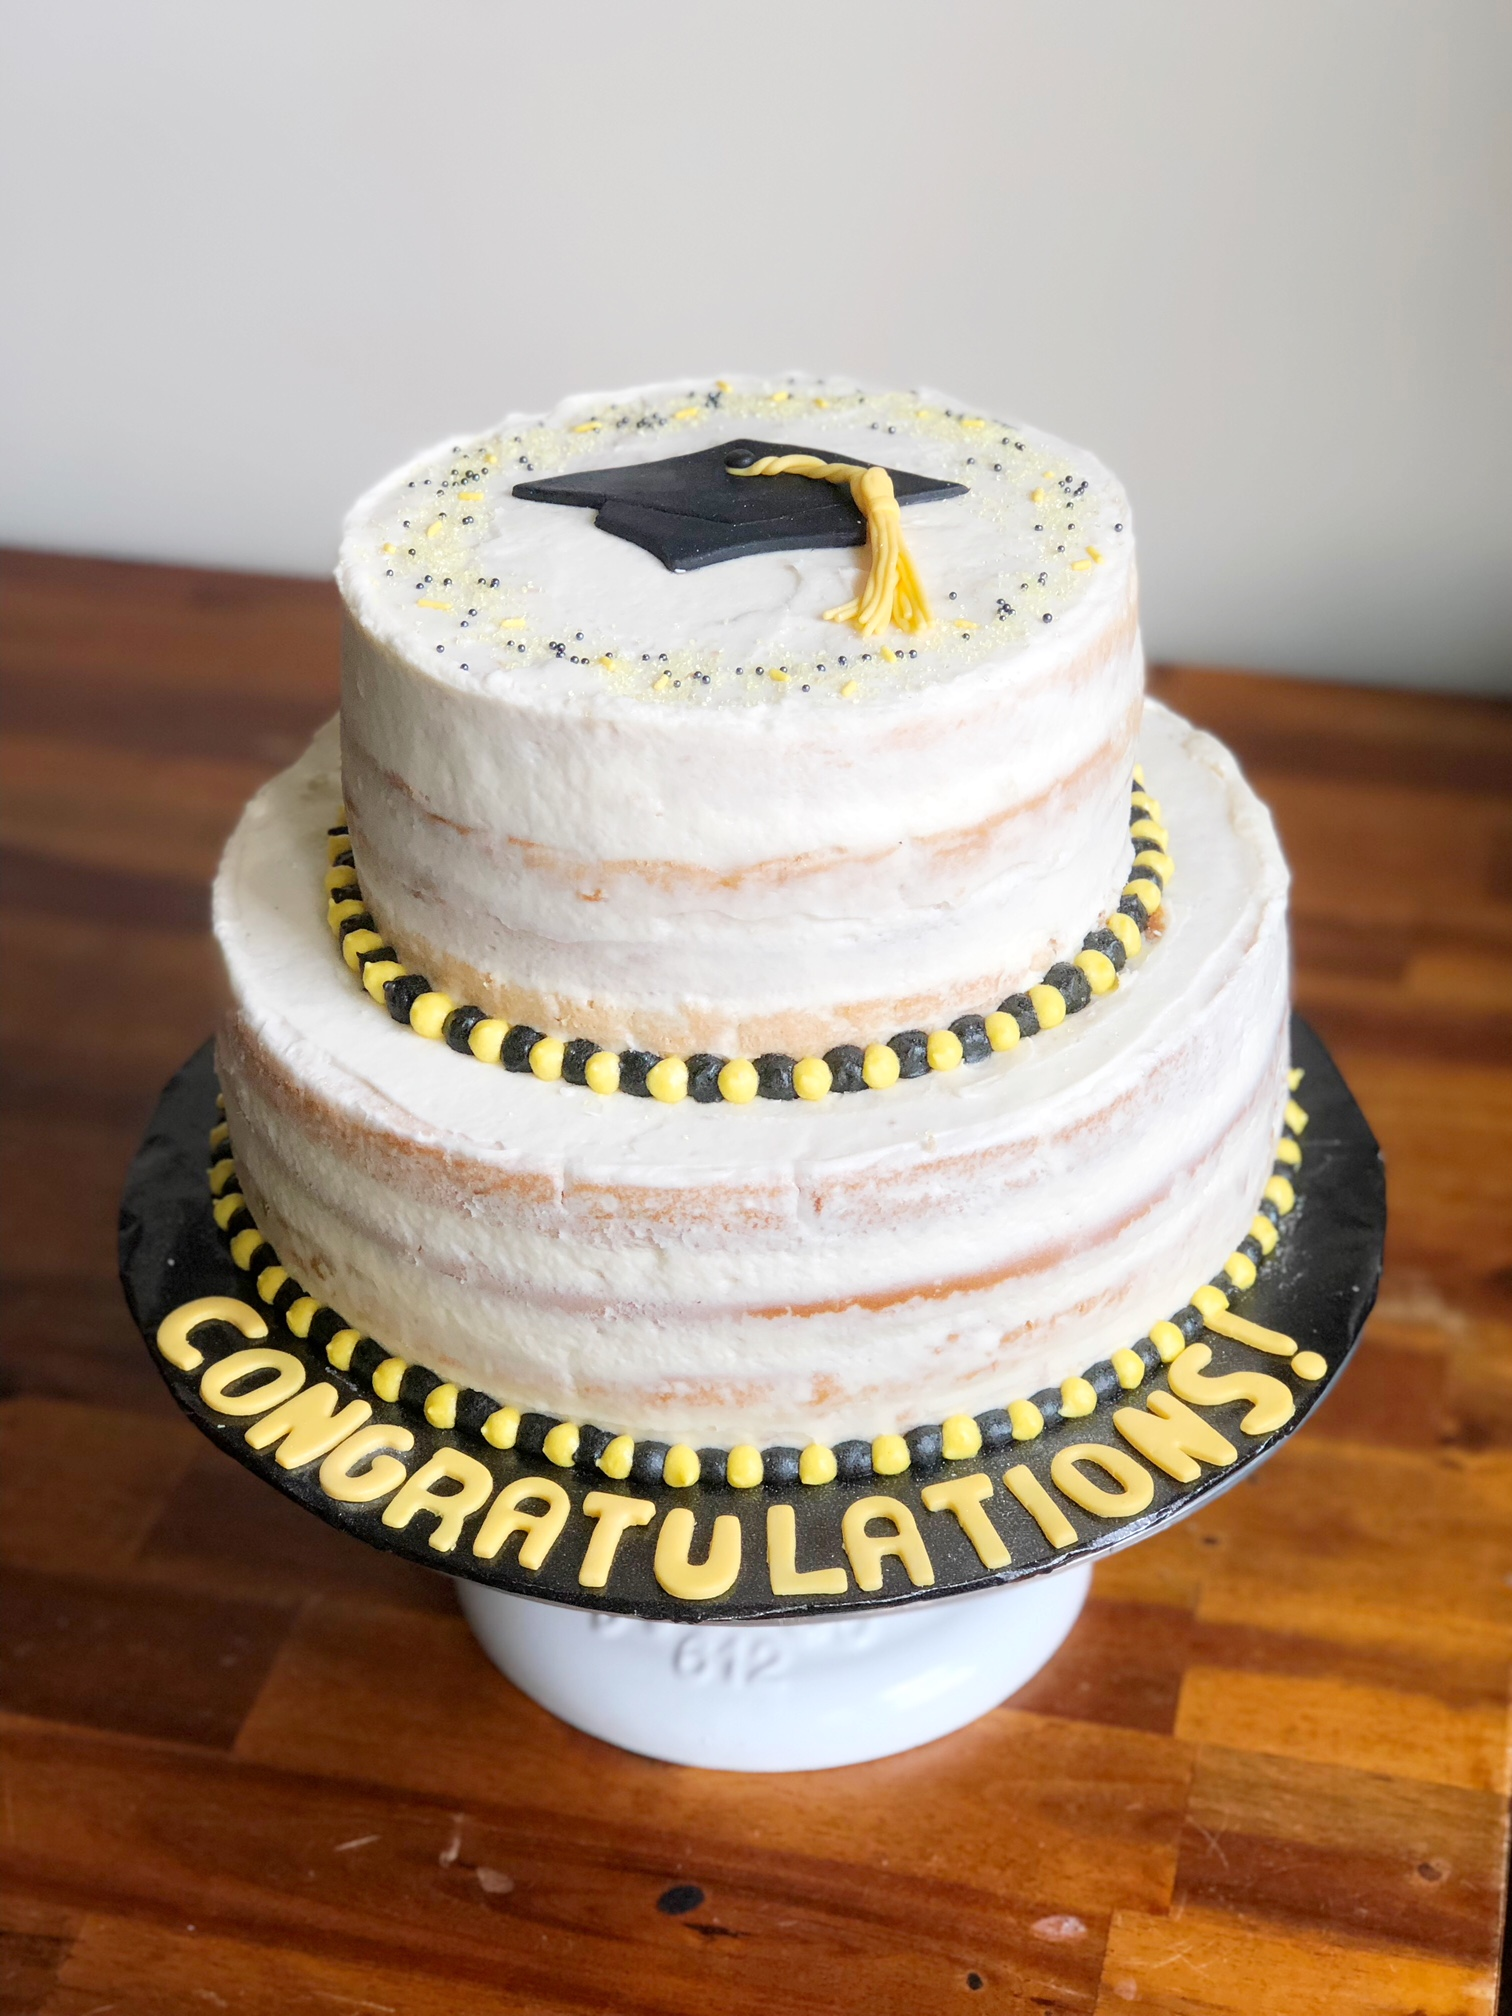 Vegan Grad cake